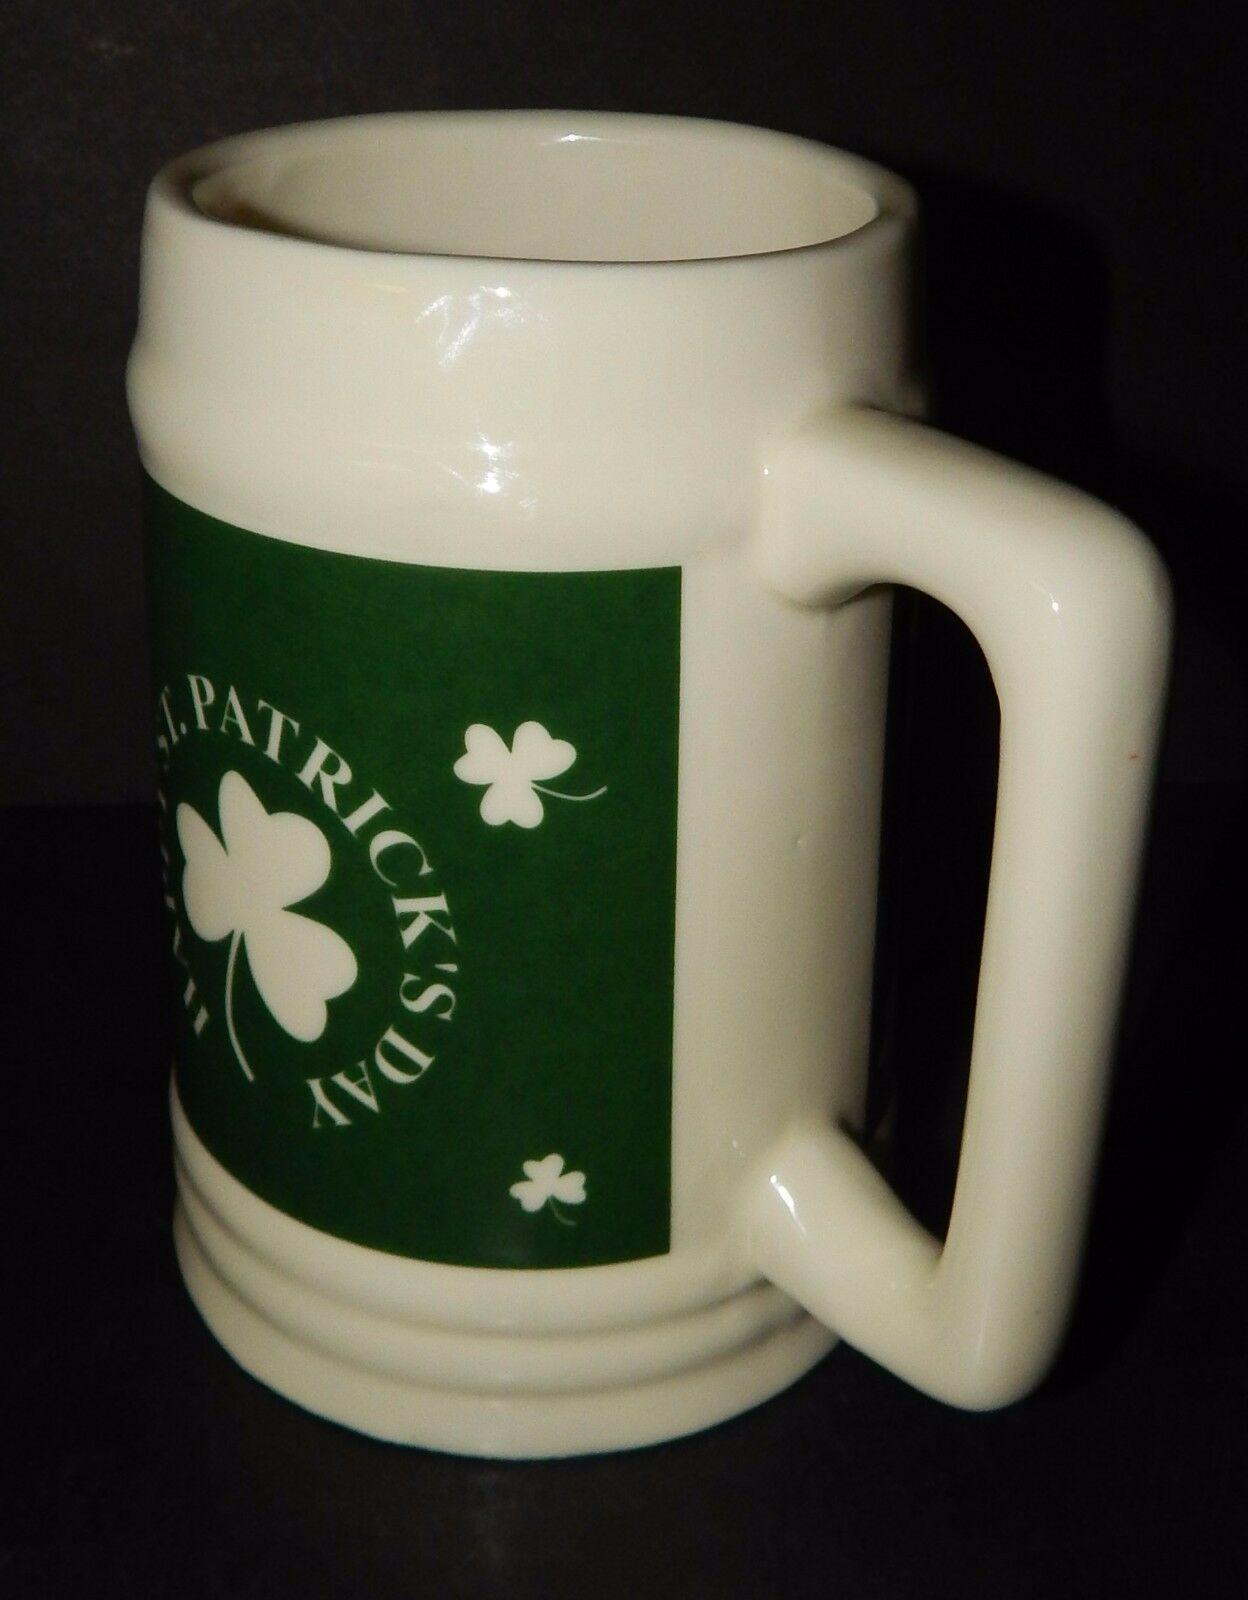 Irish Beer Stein Mug Happy St Patrick's Day  TB Toy Trading Company Big 32 oz